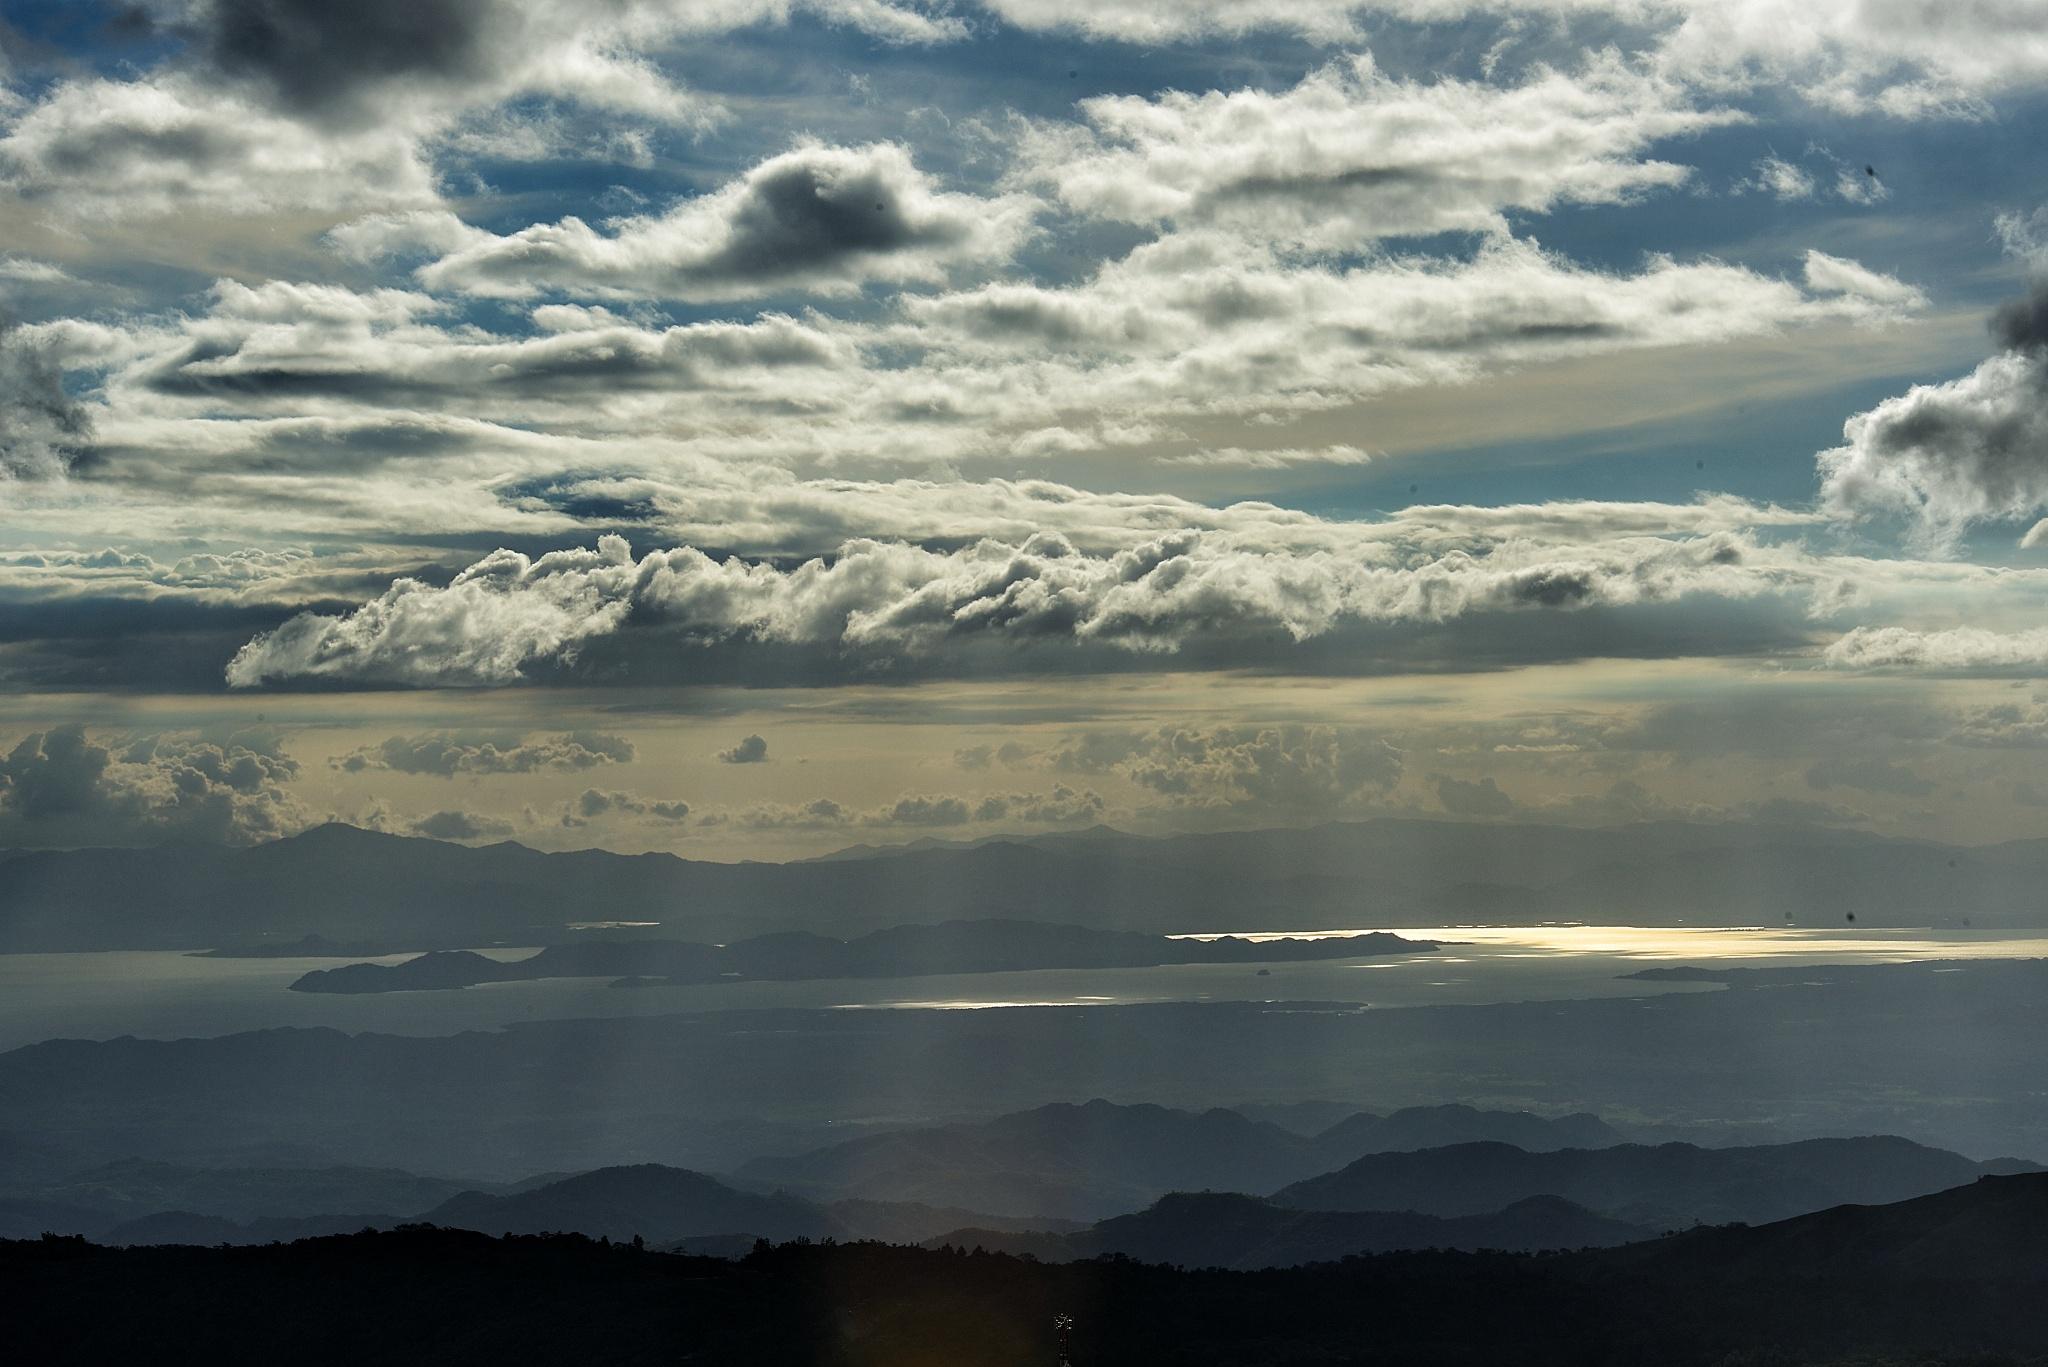 penisola di nicoia